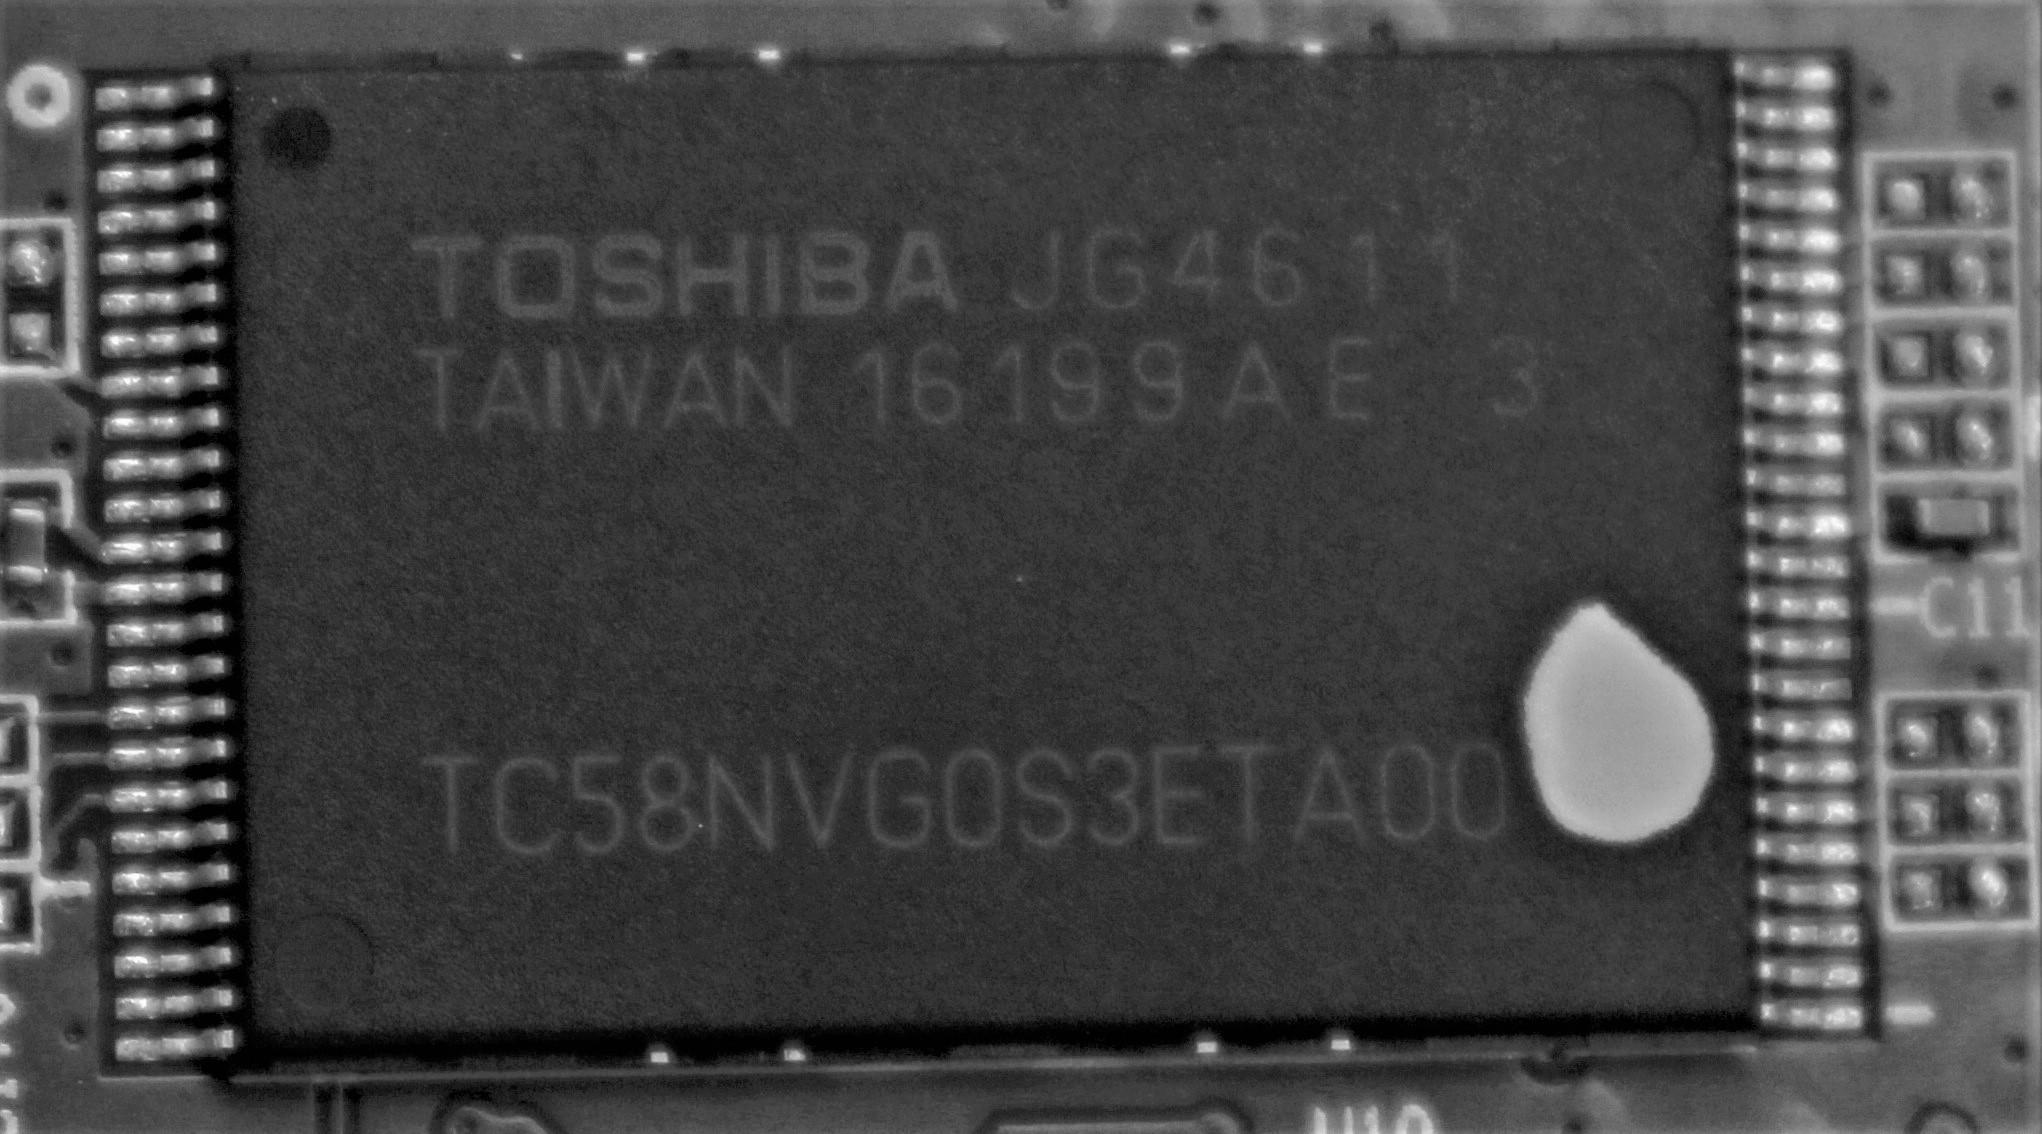 OpenWrt Project: Huawei HG659 b